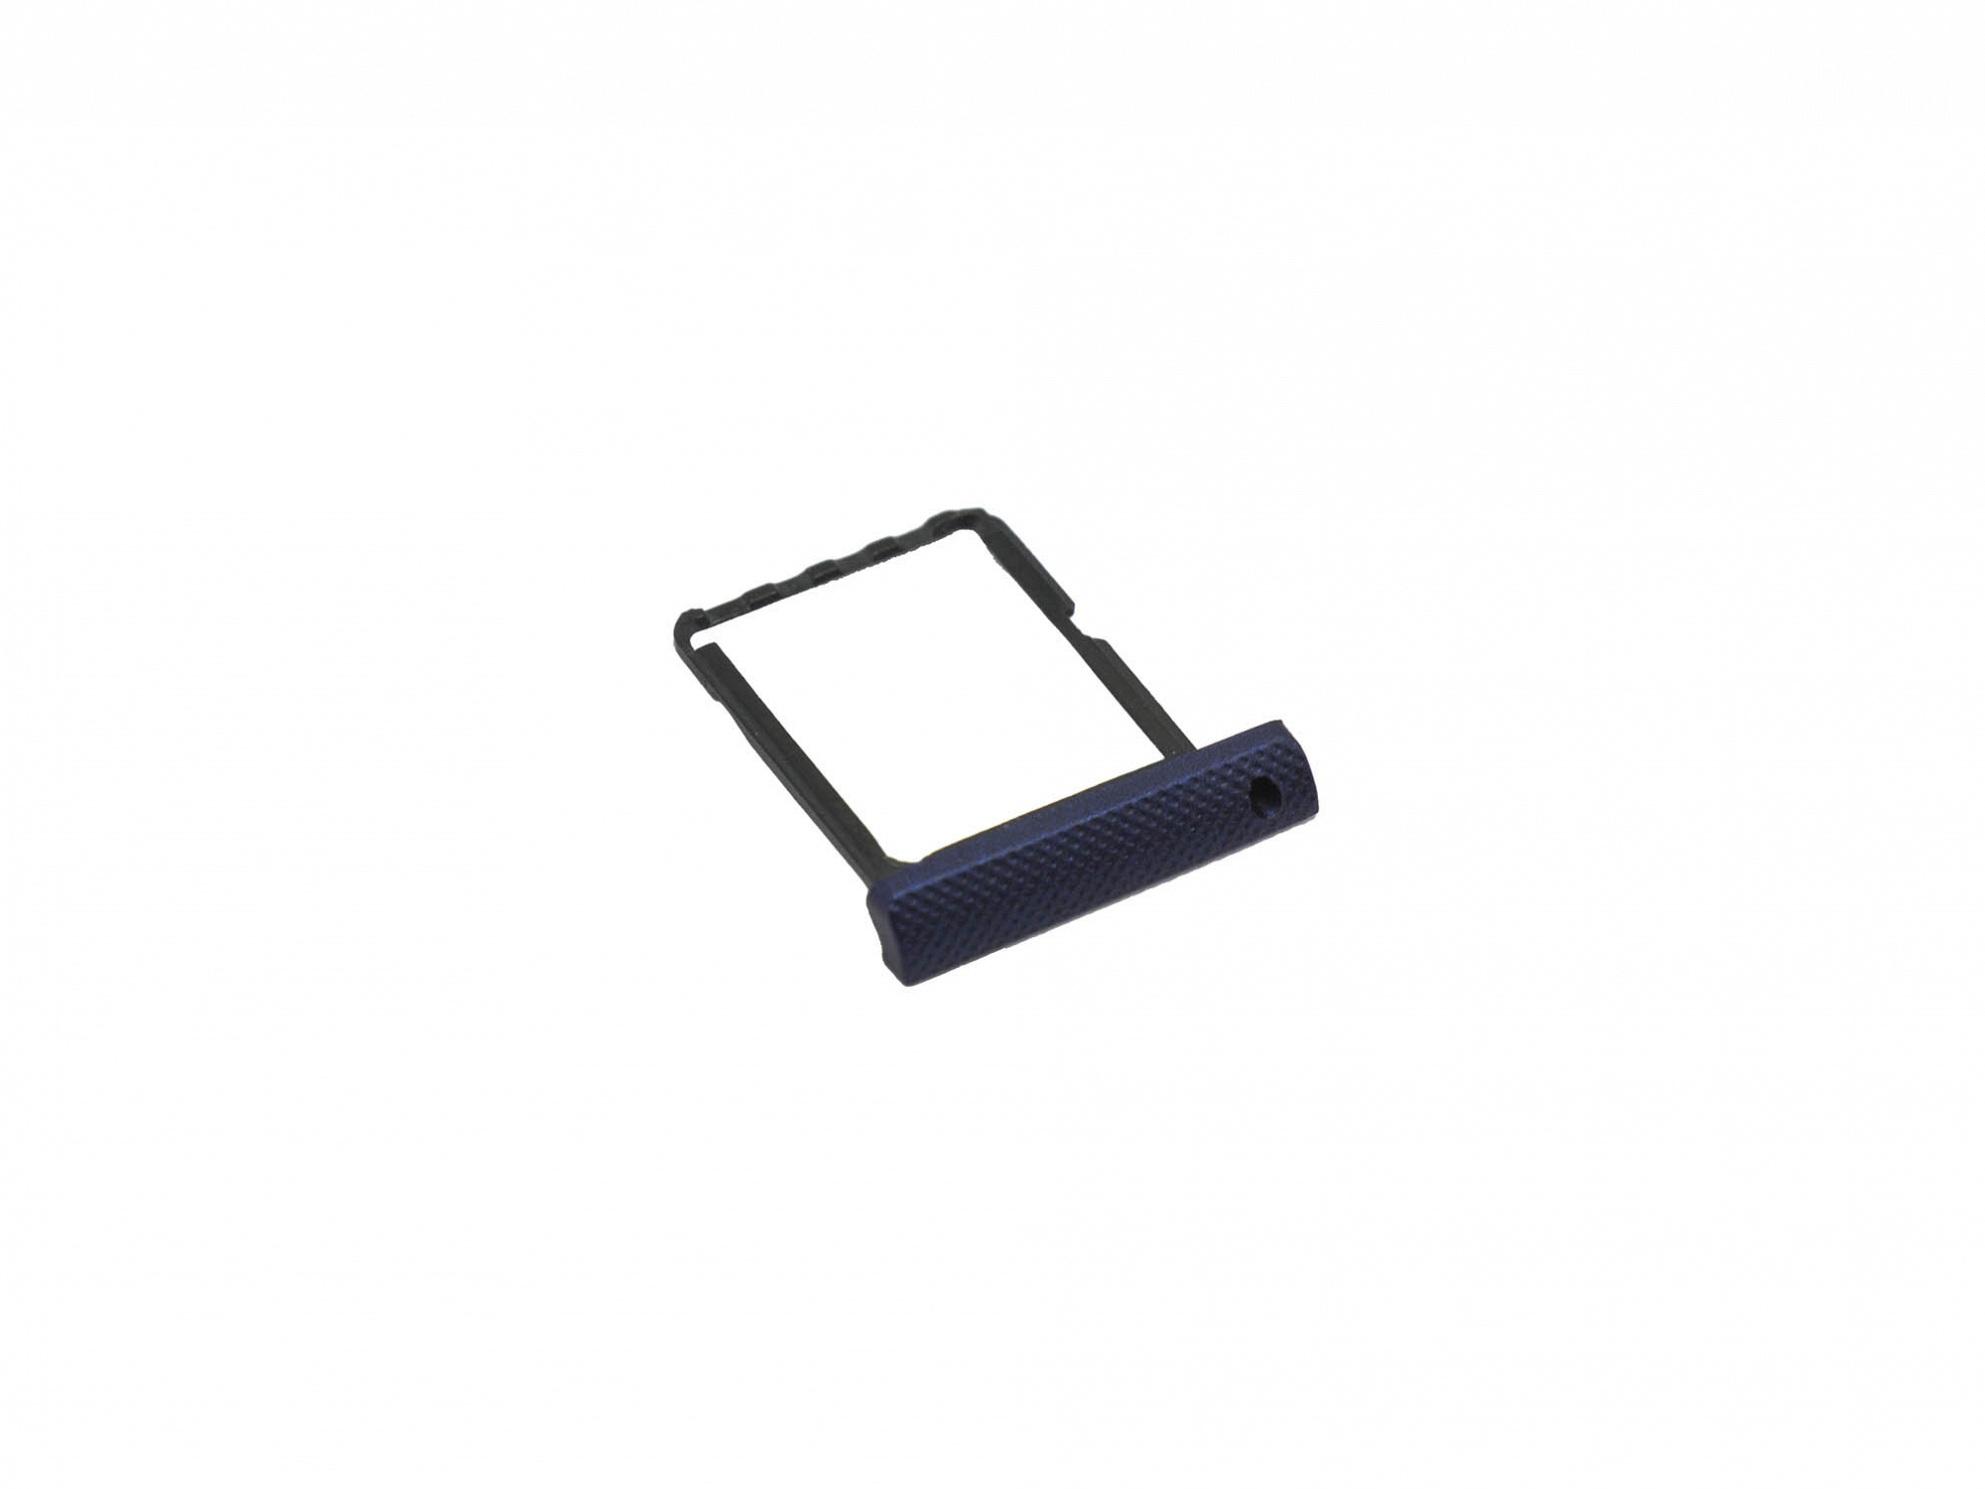 HR03CL SIM-Kartenhalter